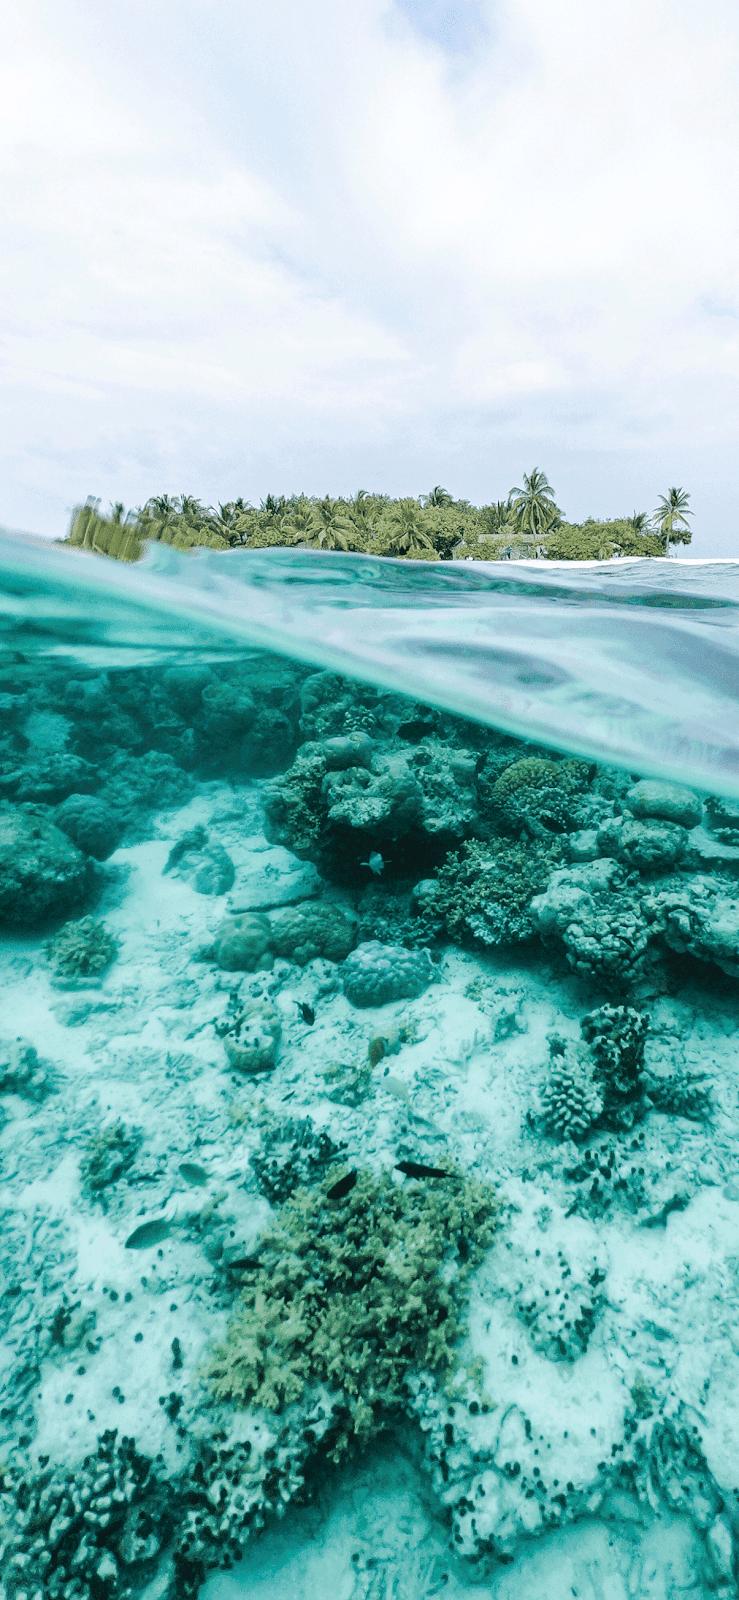 Underwater Ocean Wallpaper Iphone 739x1600 Wallpaper Teahub Io